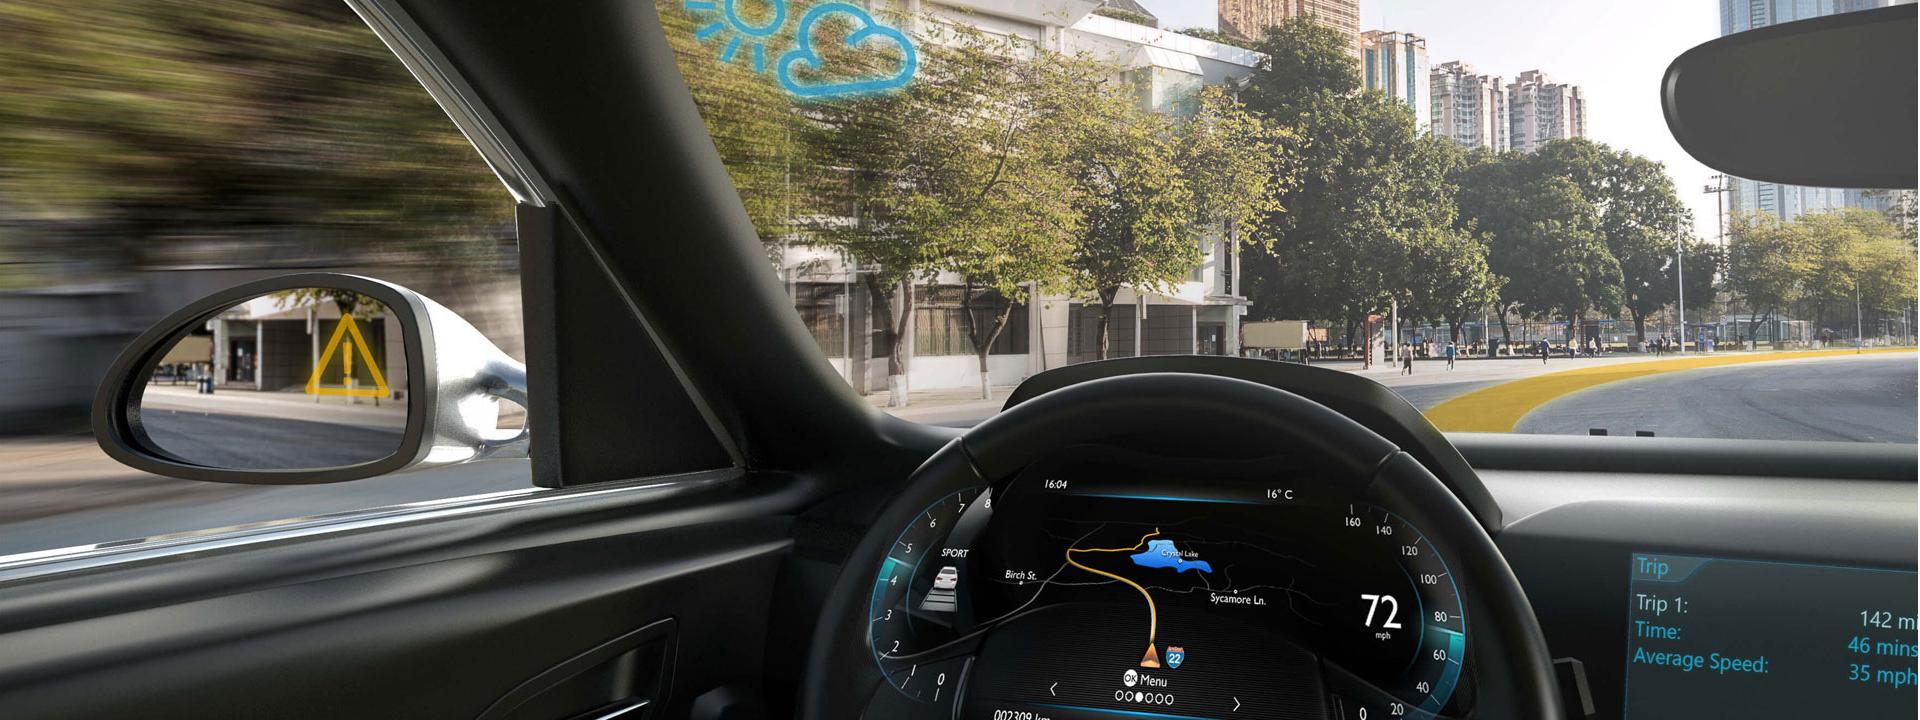 visteon-cockpit-solutions-header-image-homepage-interior